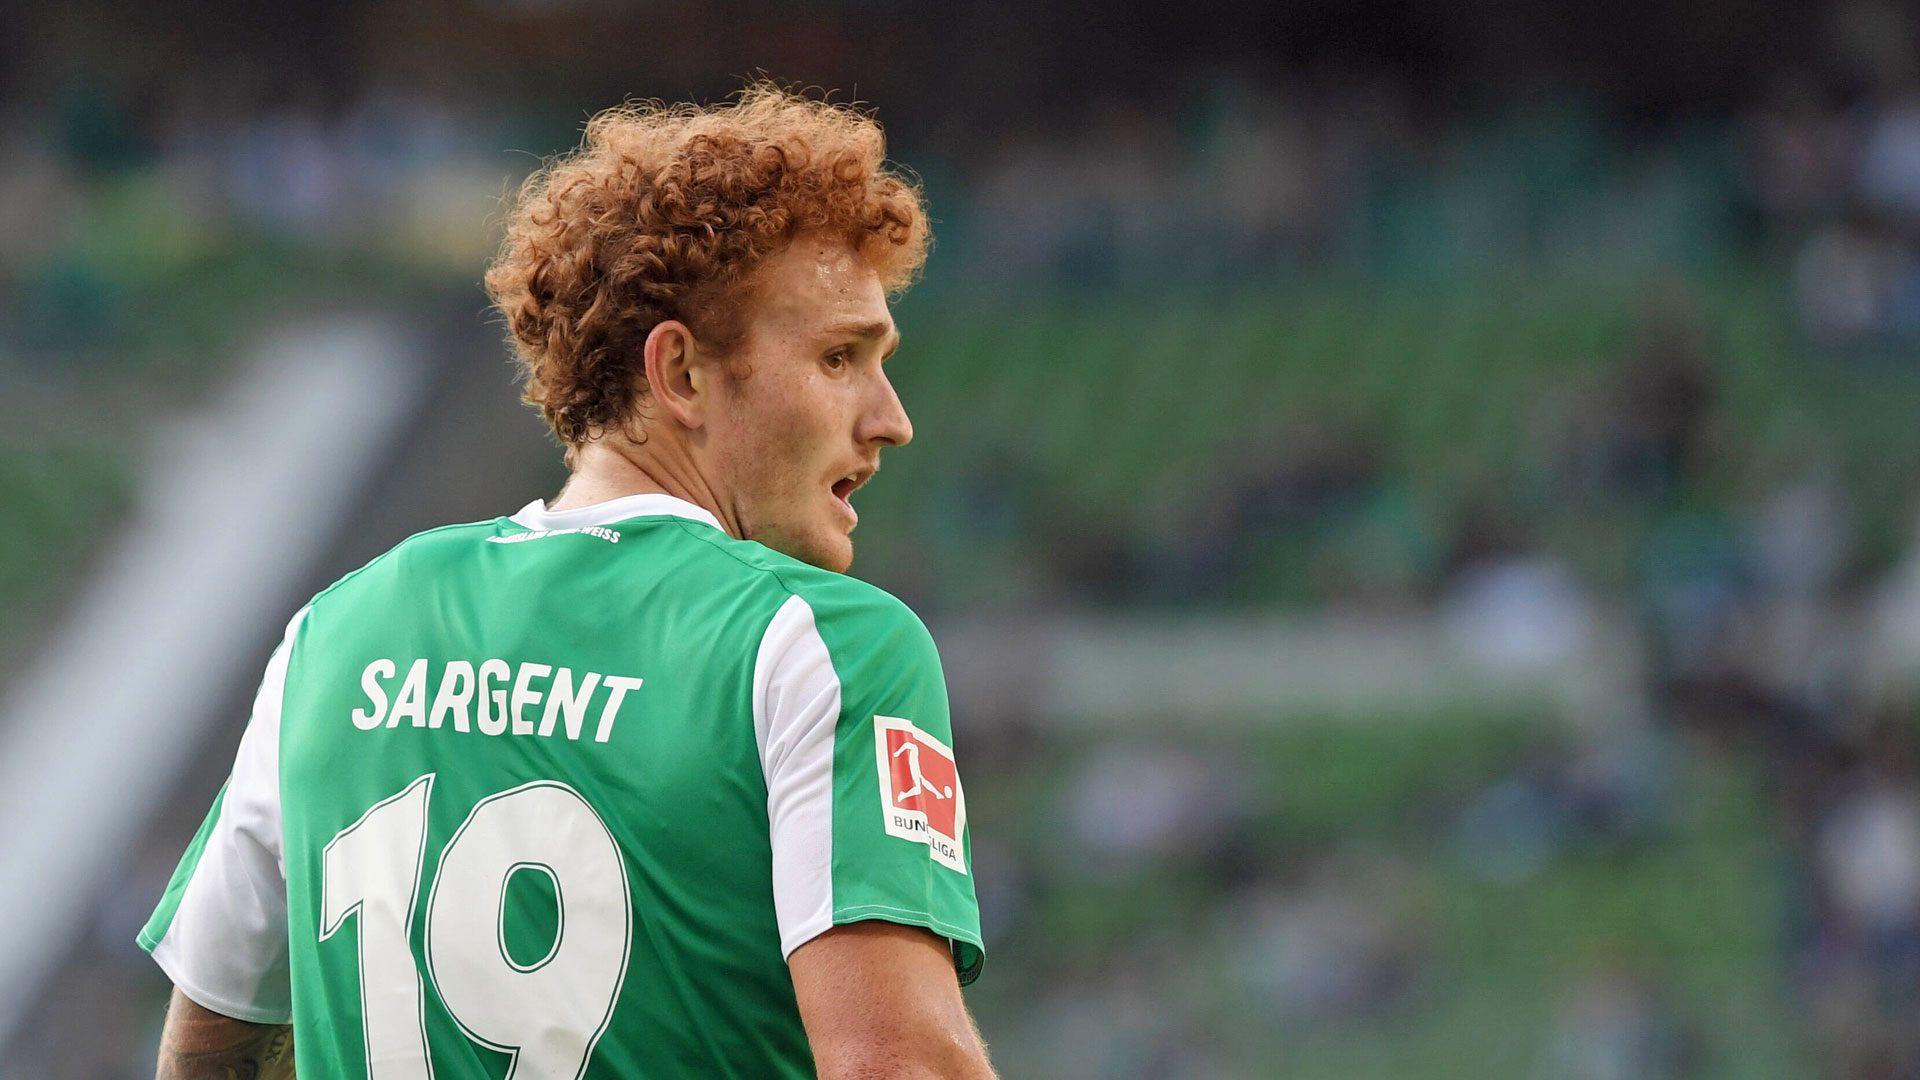 Josh Sargent: maturing into Bremen's main man